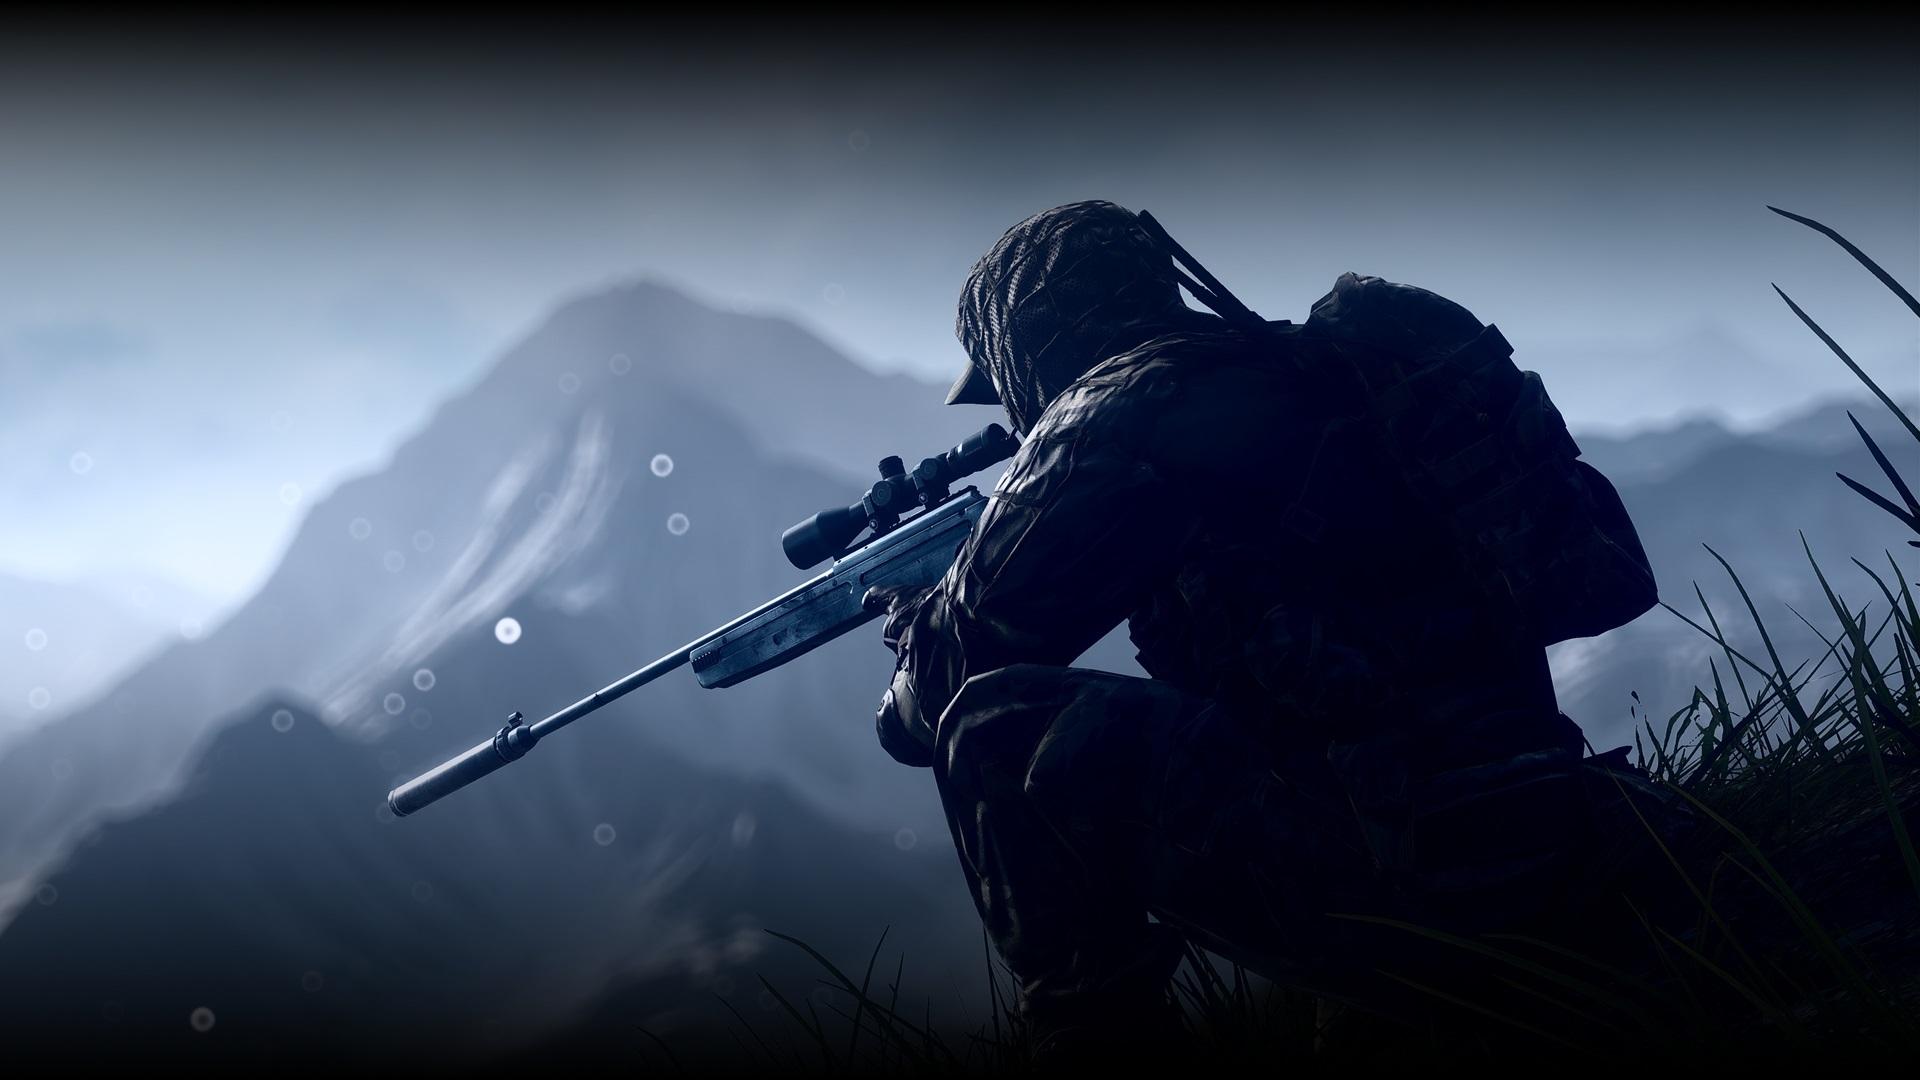 Battlefield 4, soldier, sniper Wallpaper | 1920x1080 Full ...  Battlefield